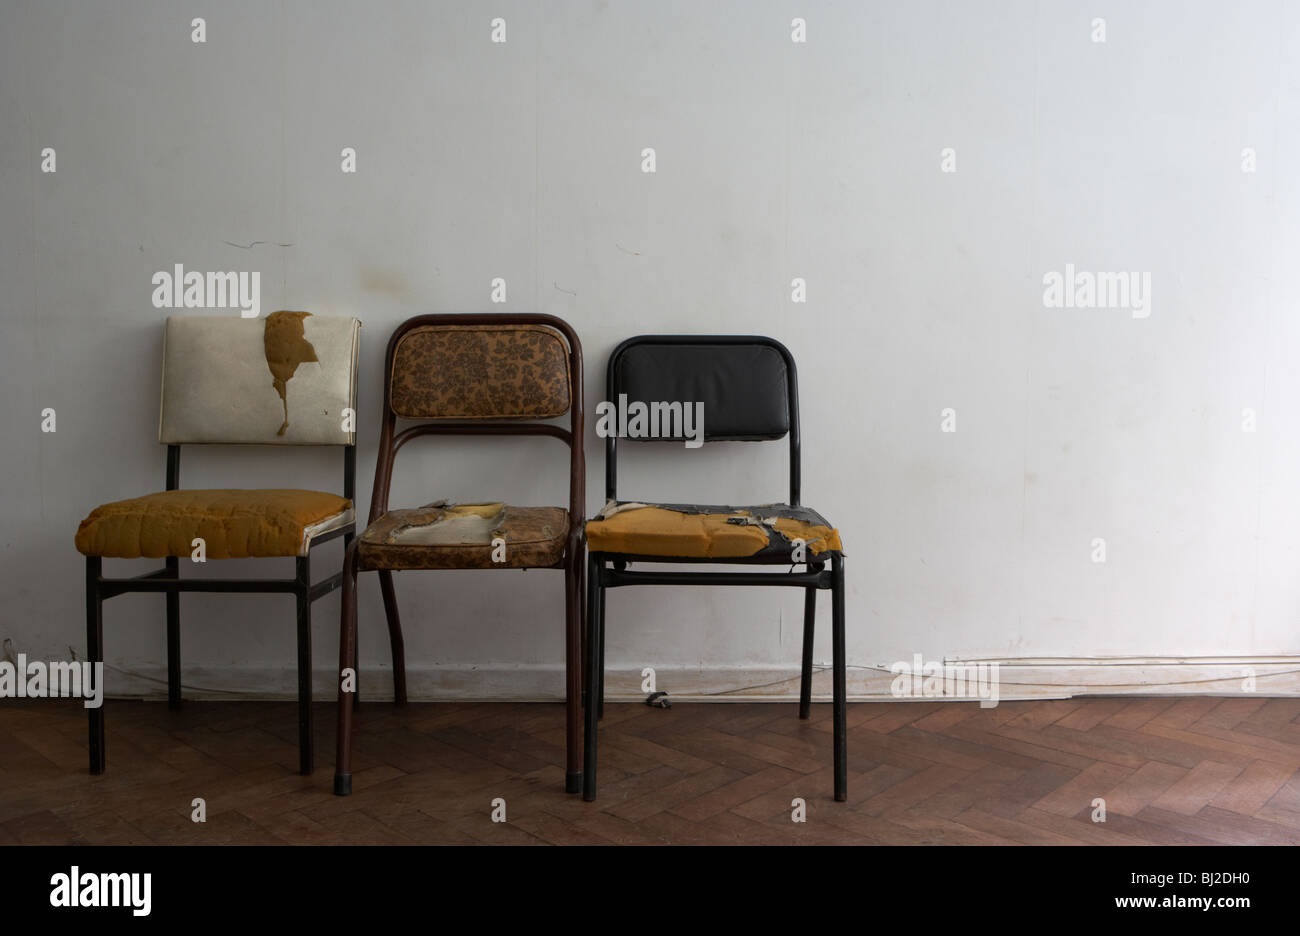 Uncomfortable Chair Stock Photos & Uncomfortable Chair Stock ...